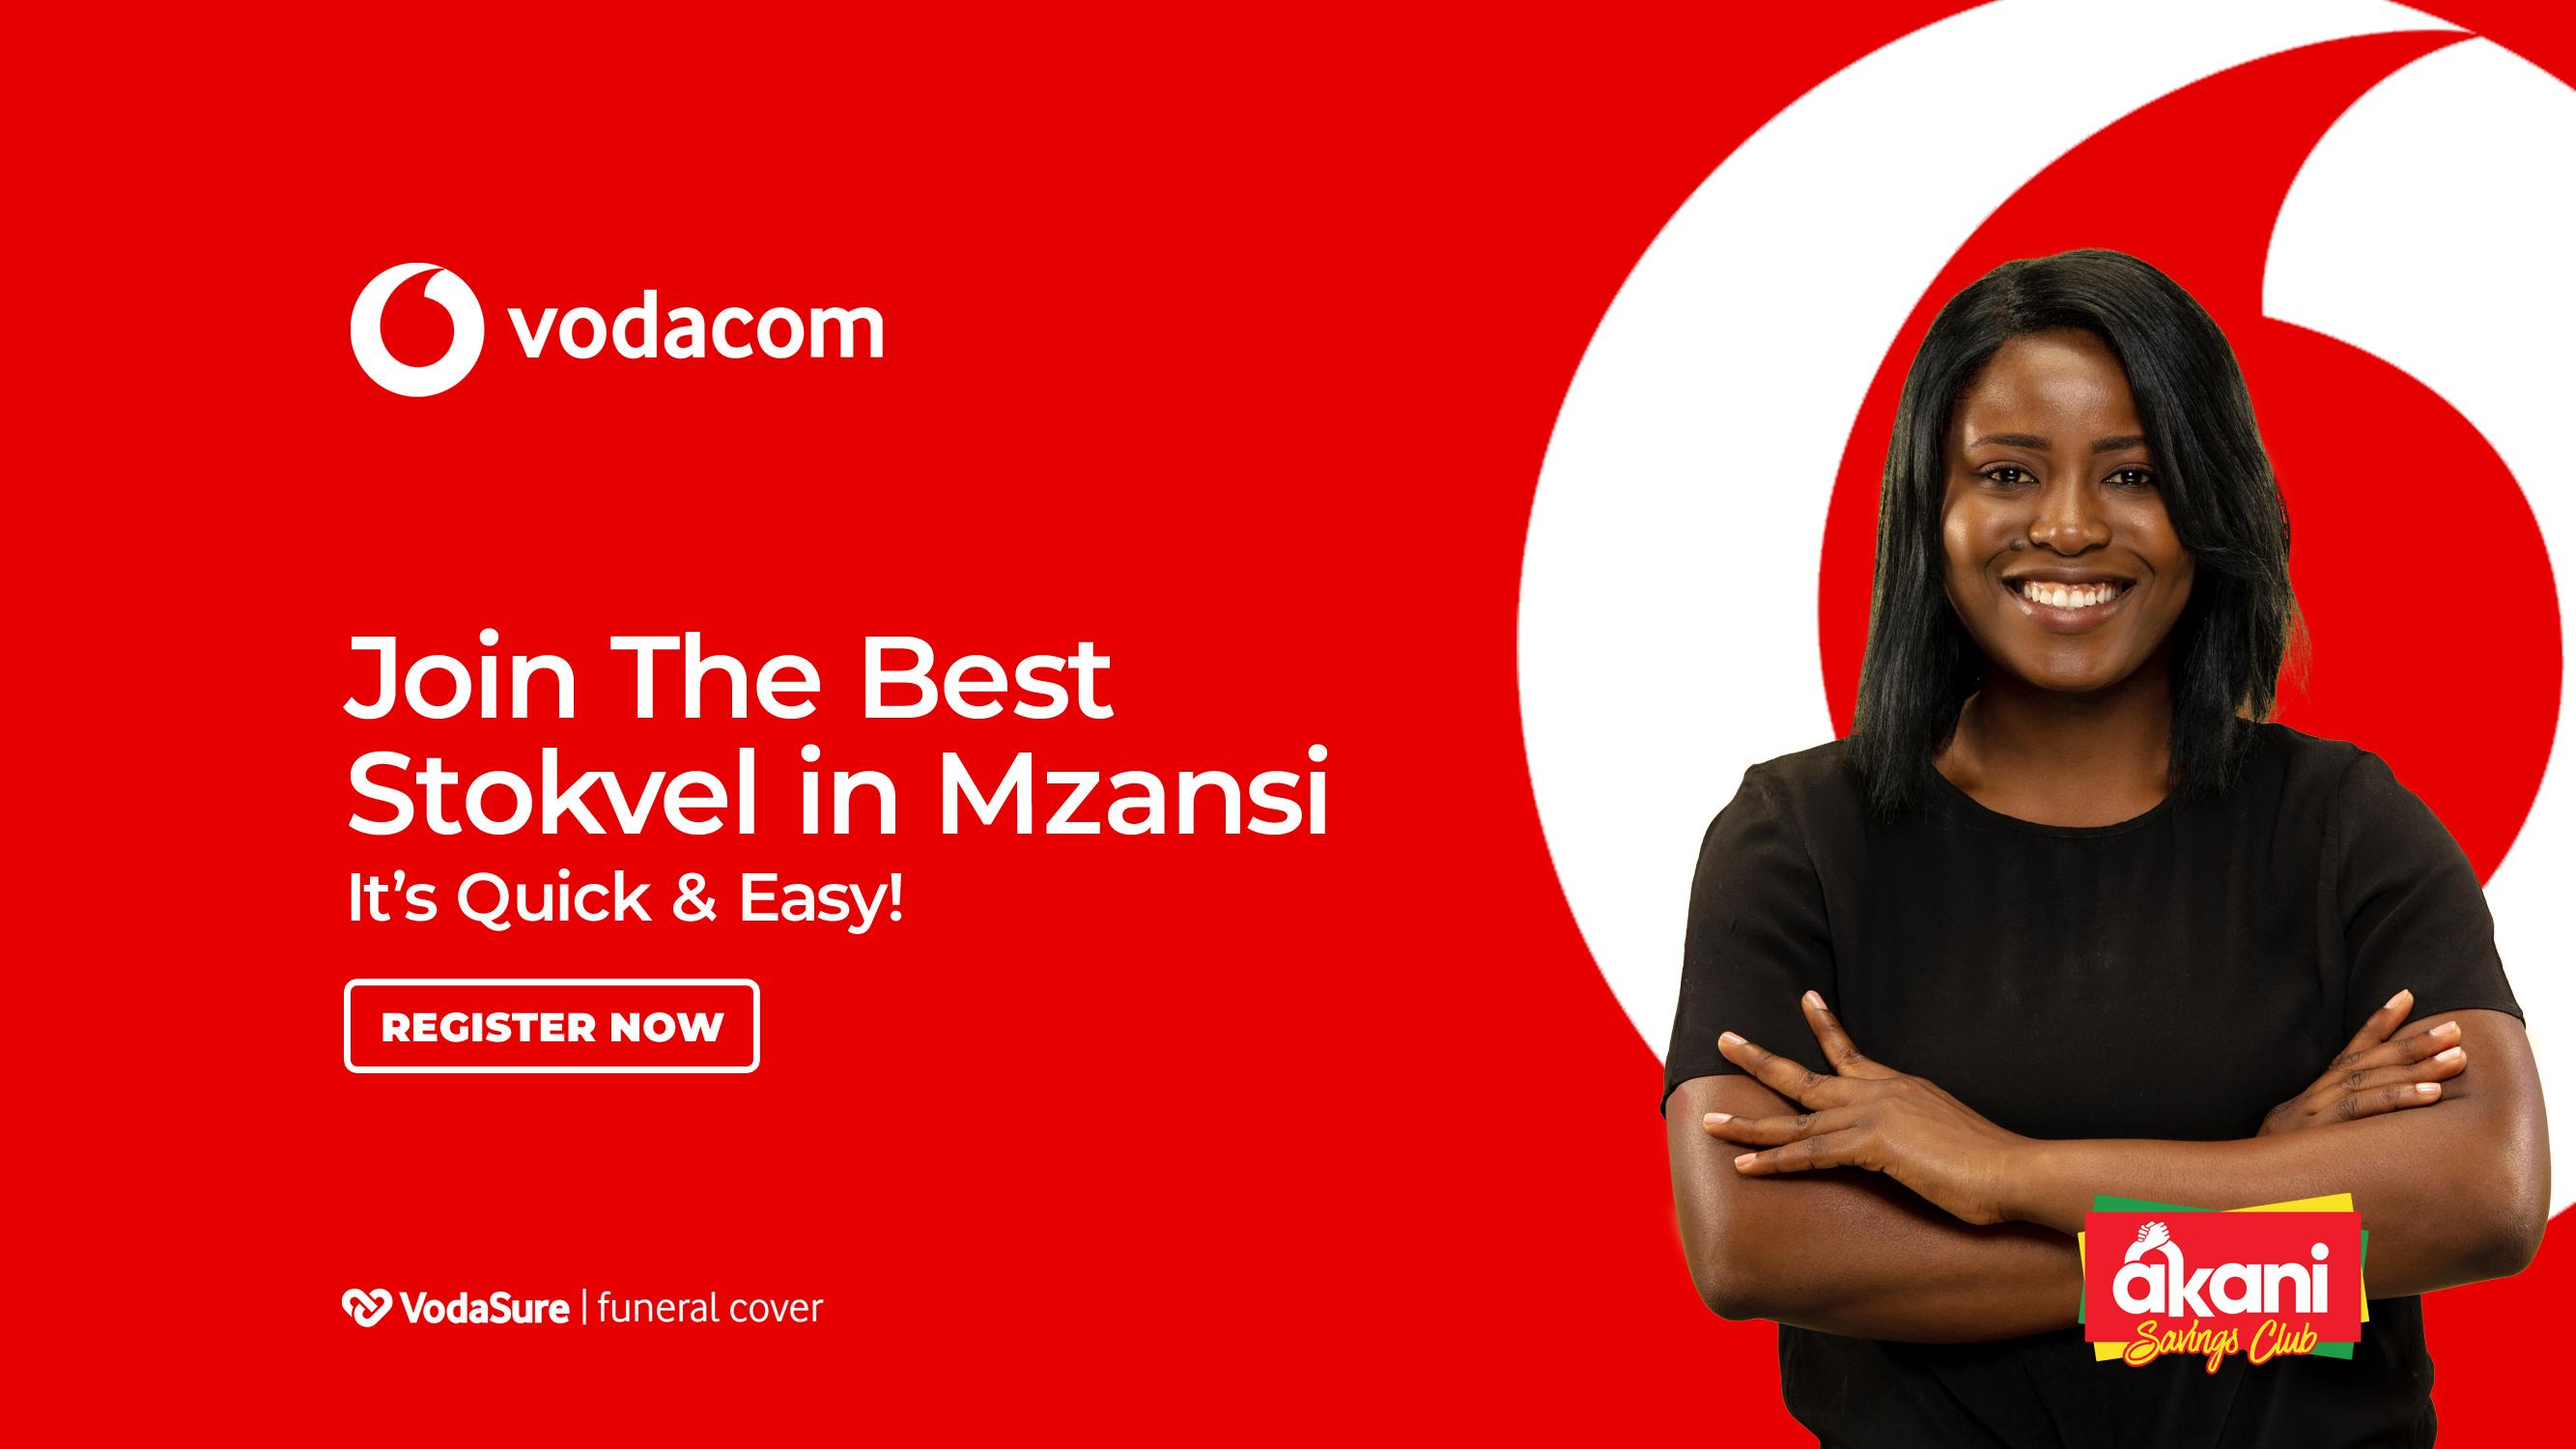 Vodacom-Akani